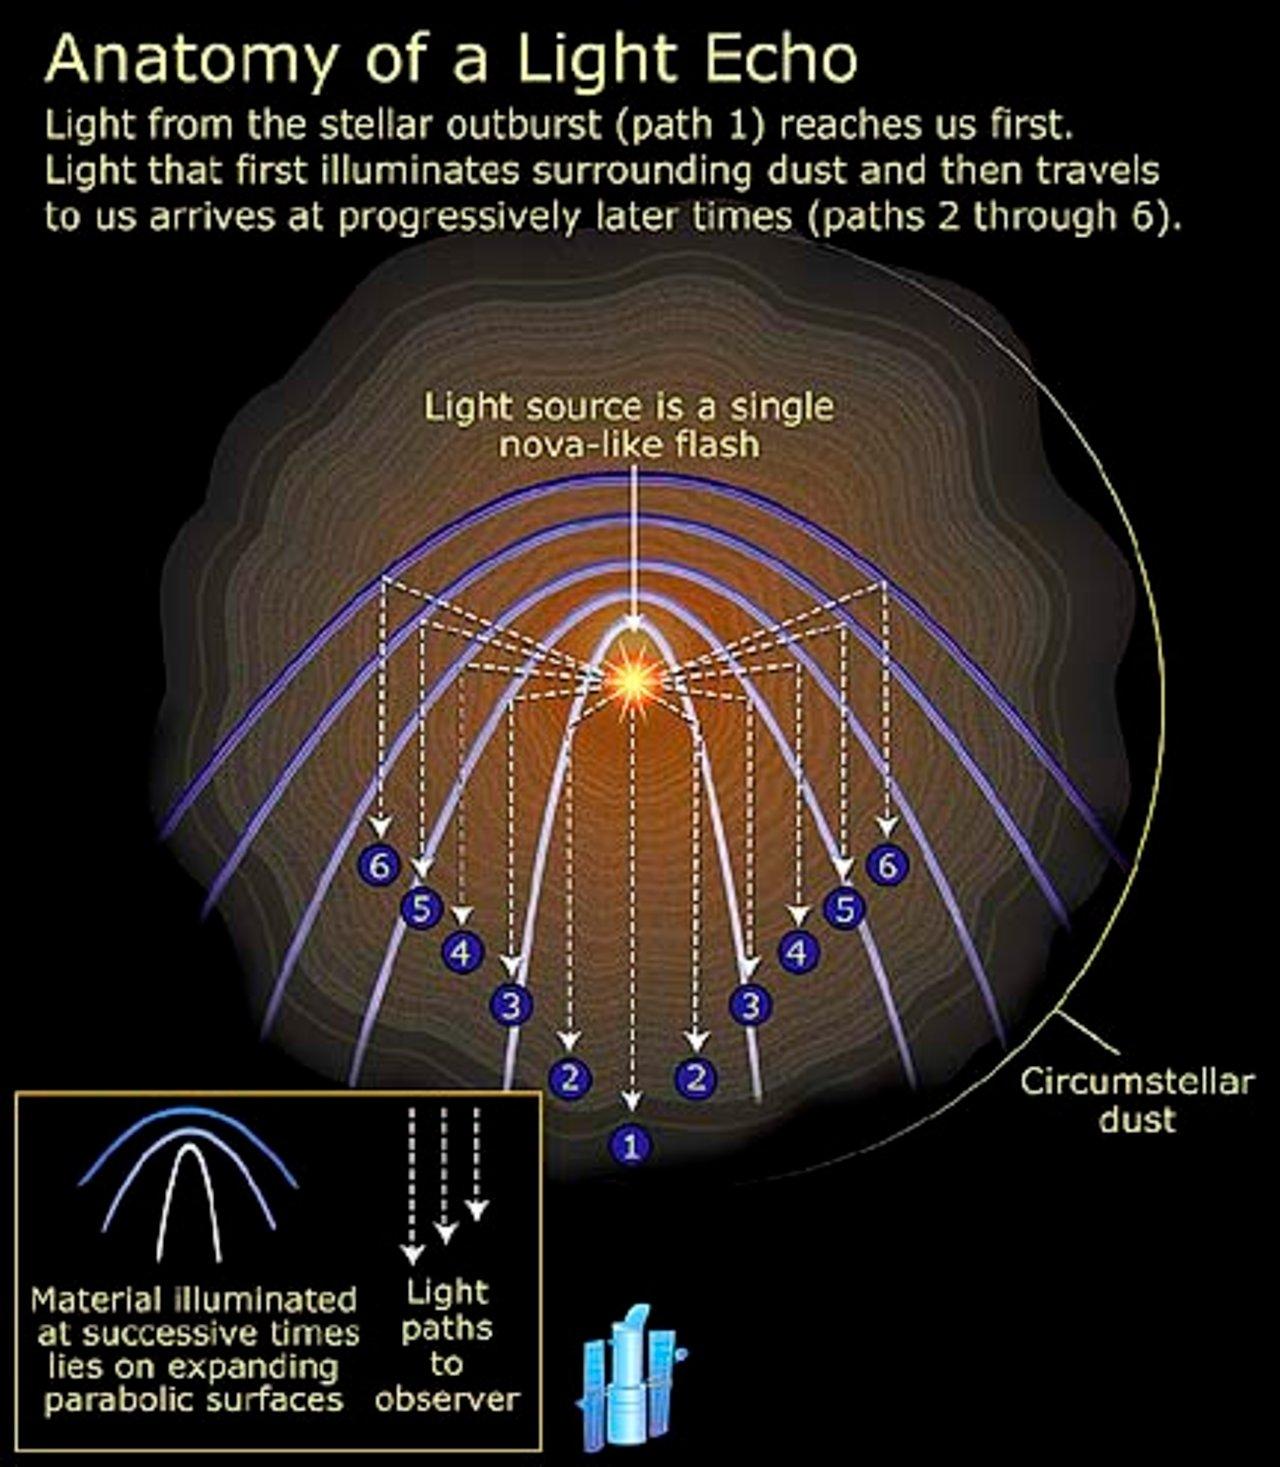 Anatomy of a light echo